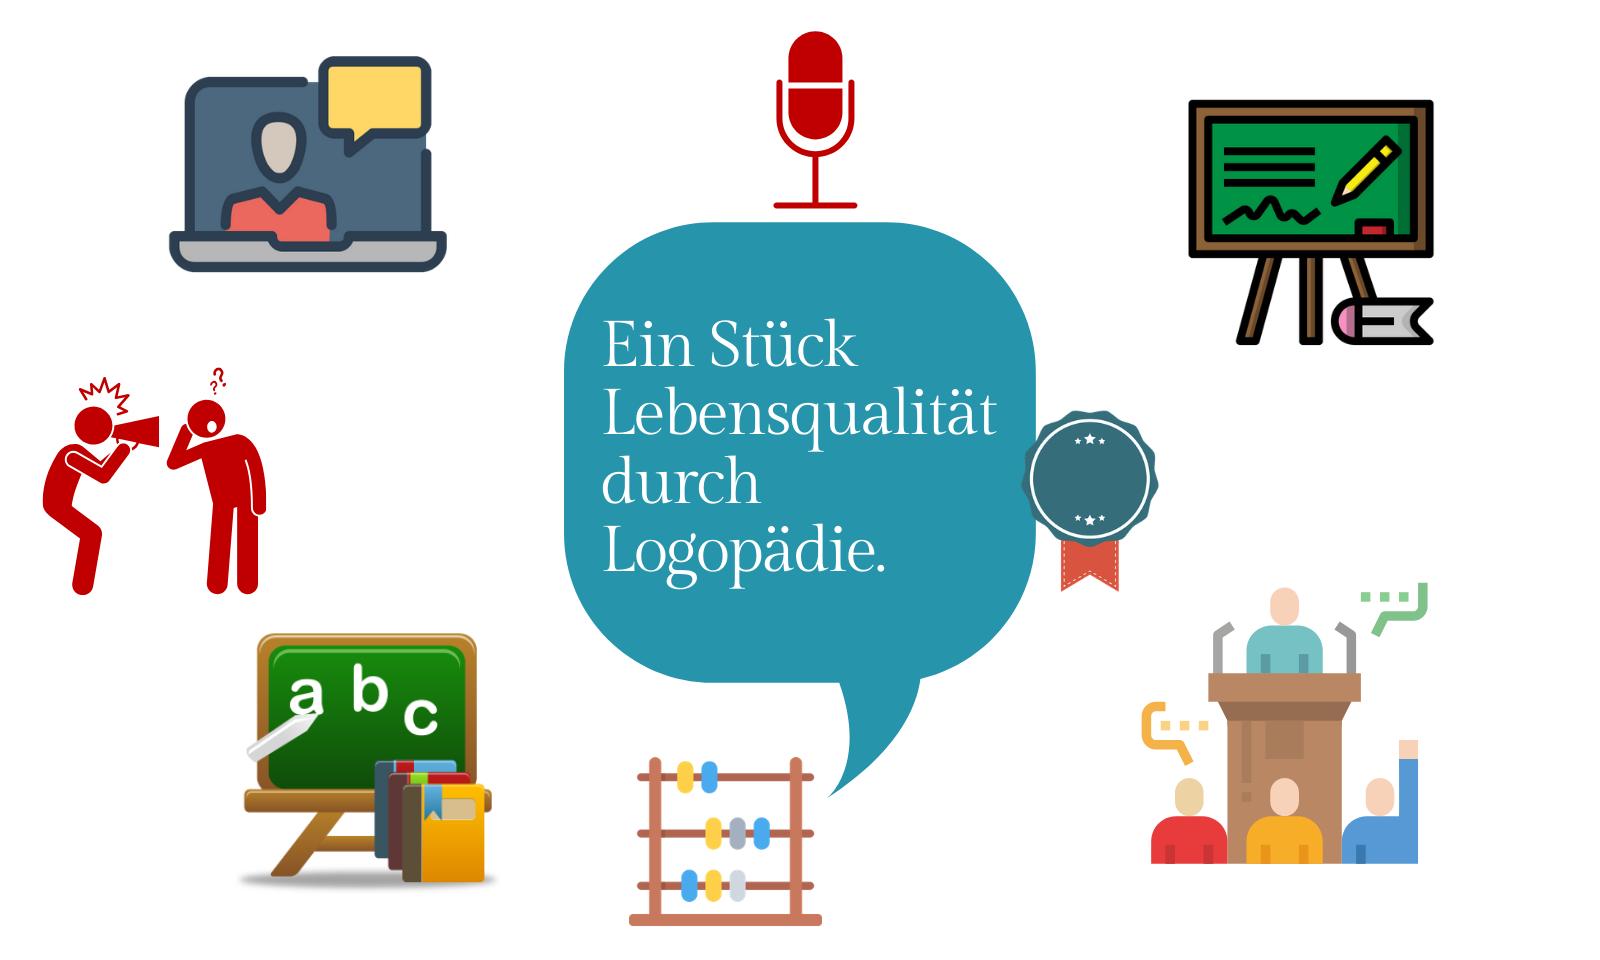 Logopädie Sprachtherapie Köln Nippes Lebensqualität steigern